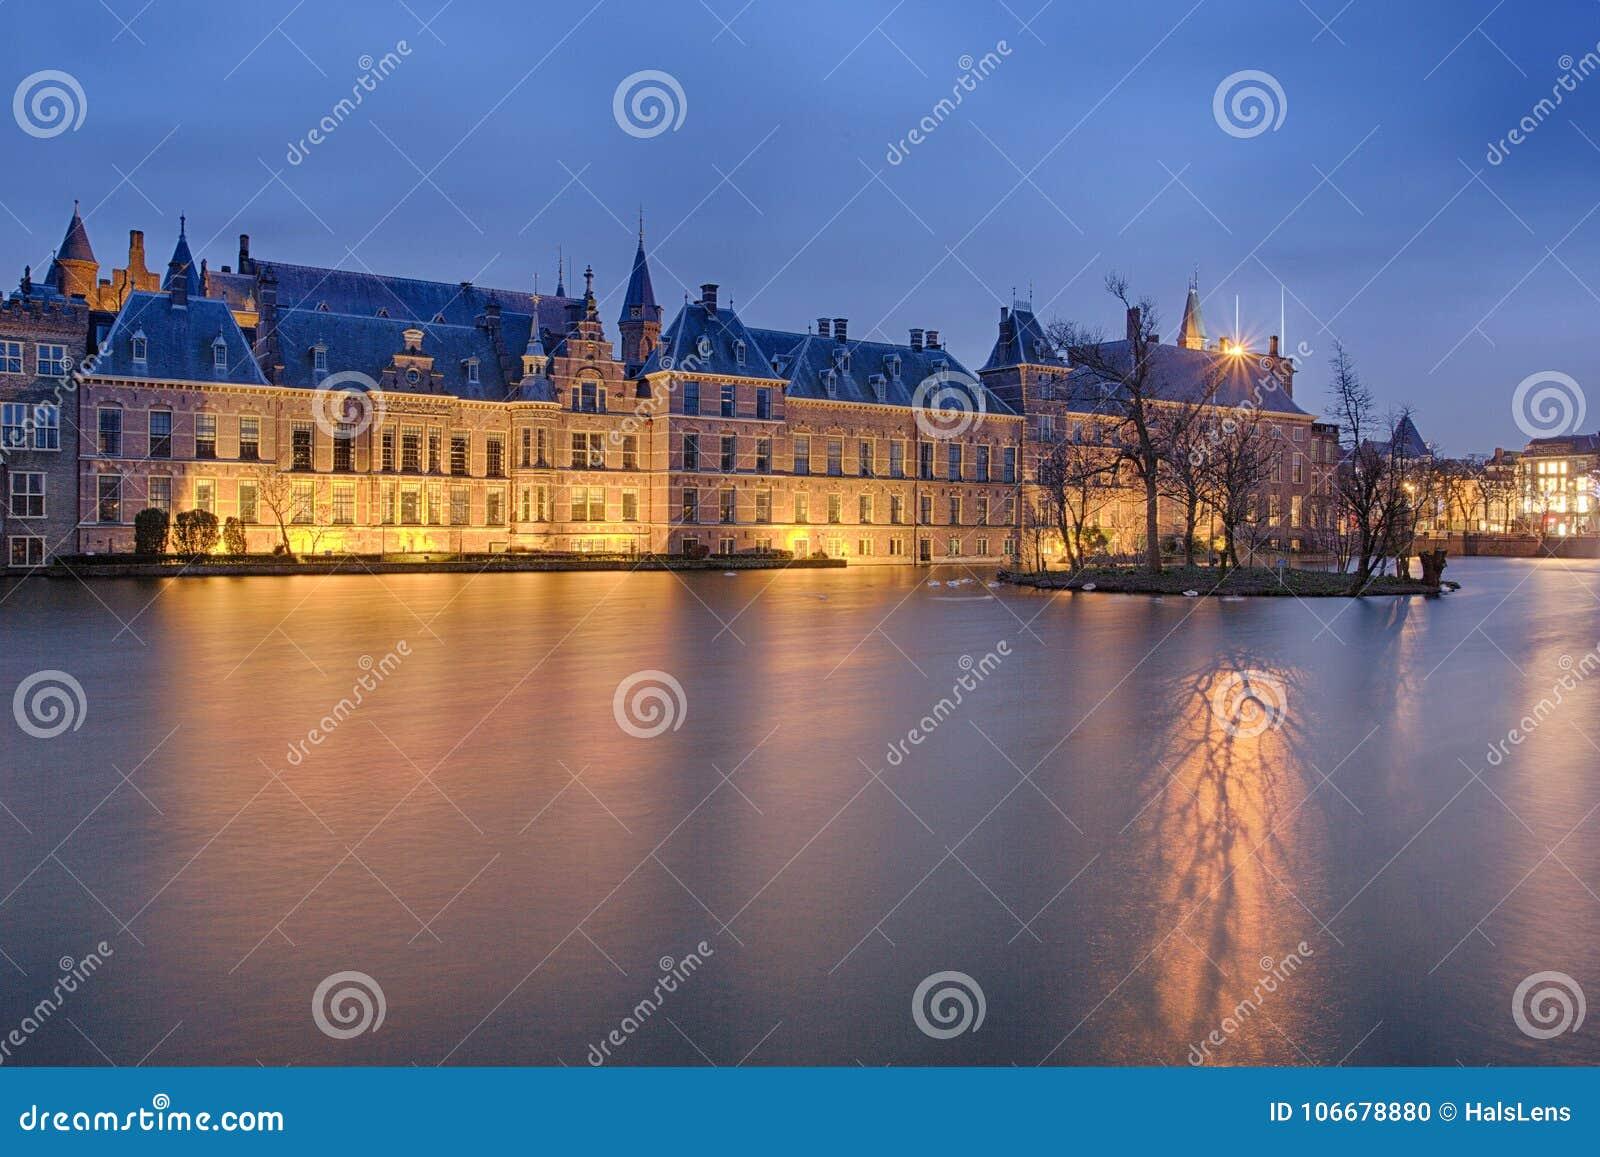 Buitenhof, дома голландского парламента в Гааге